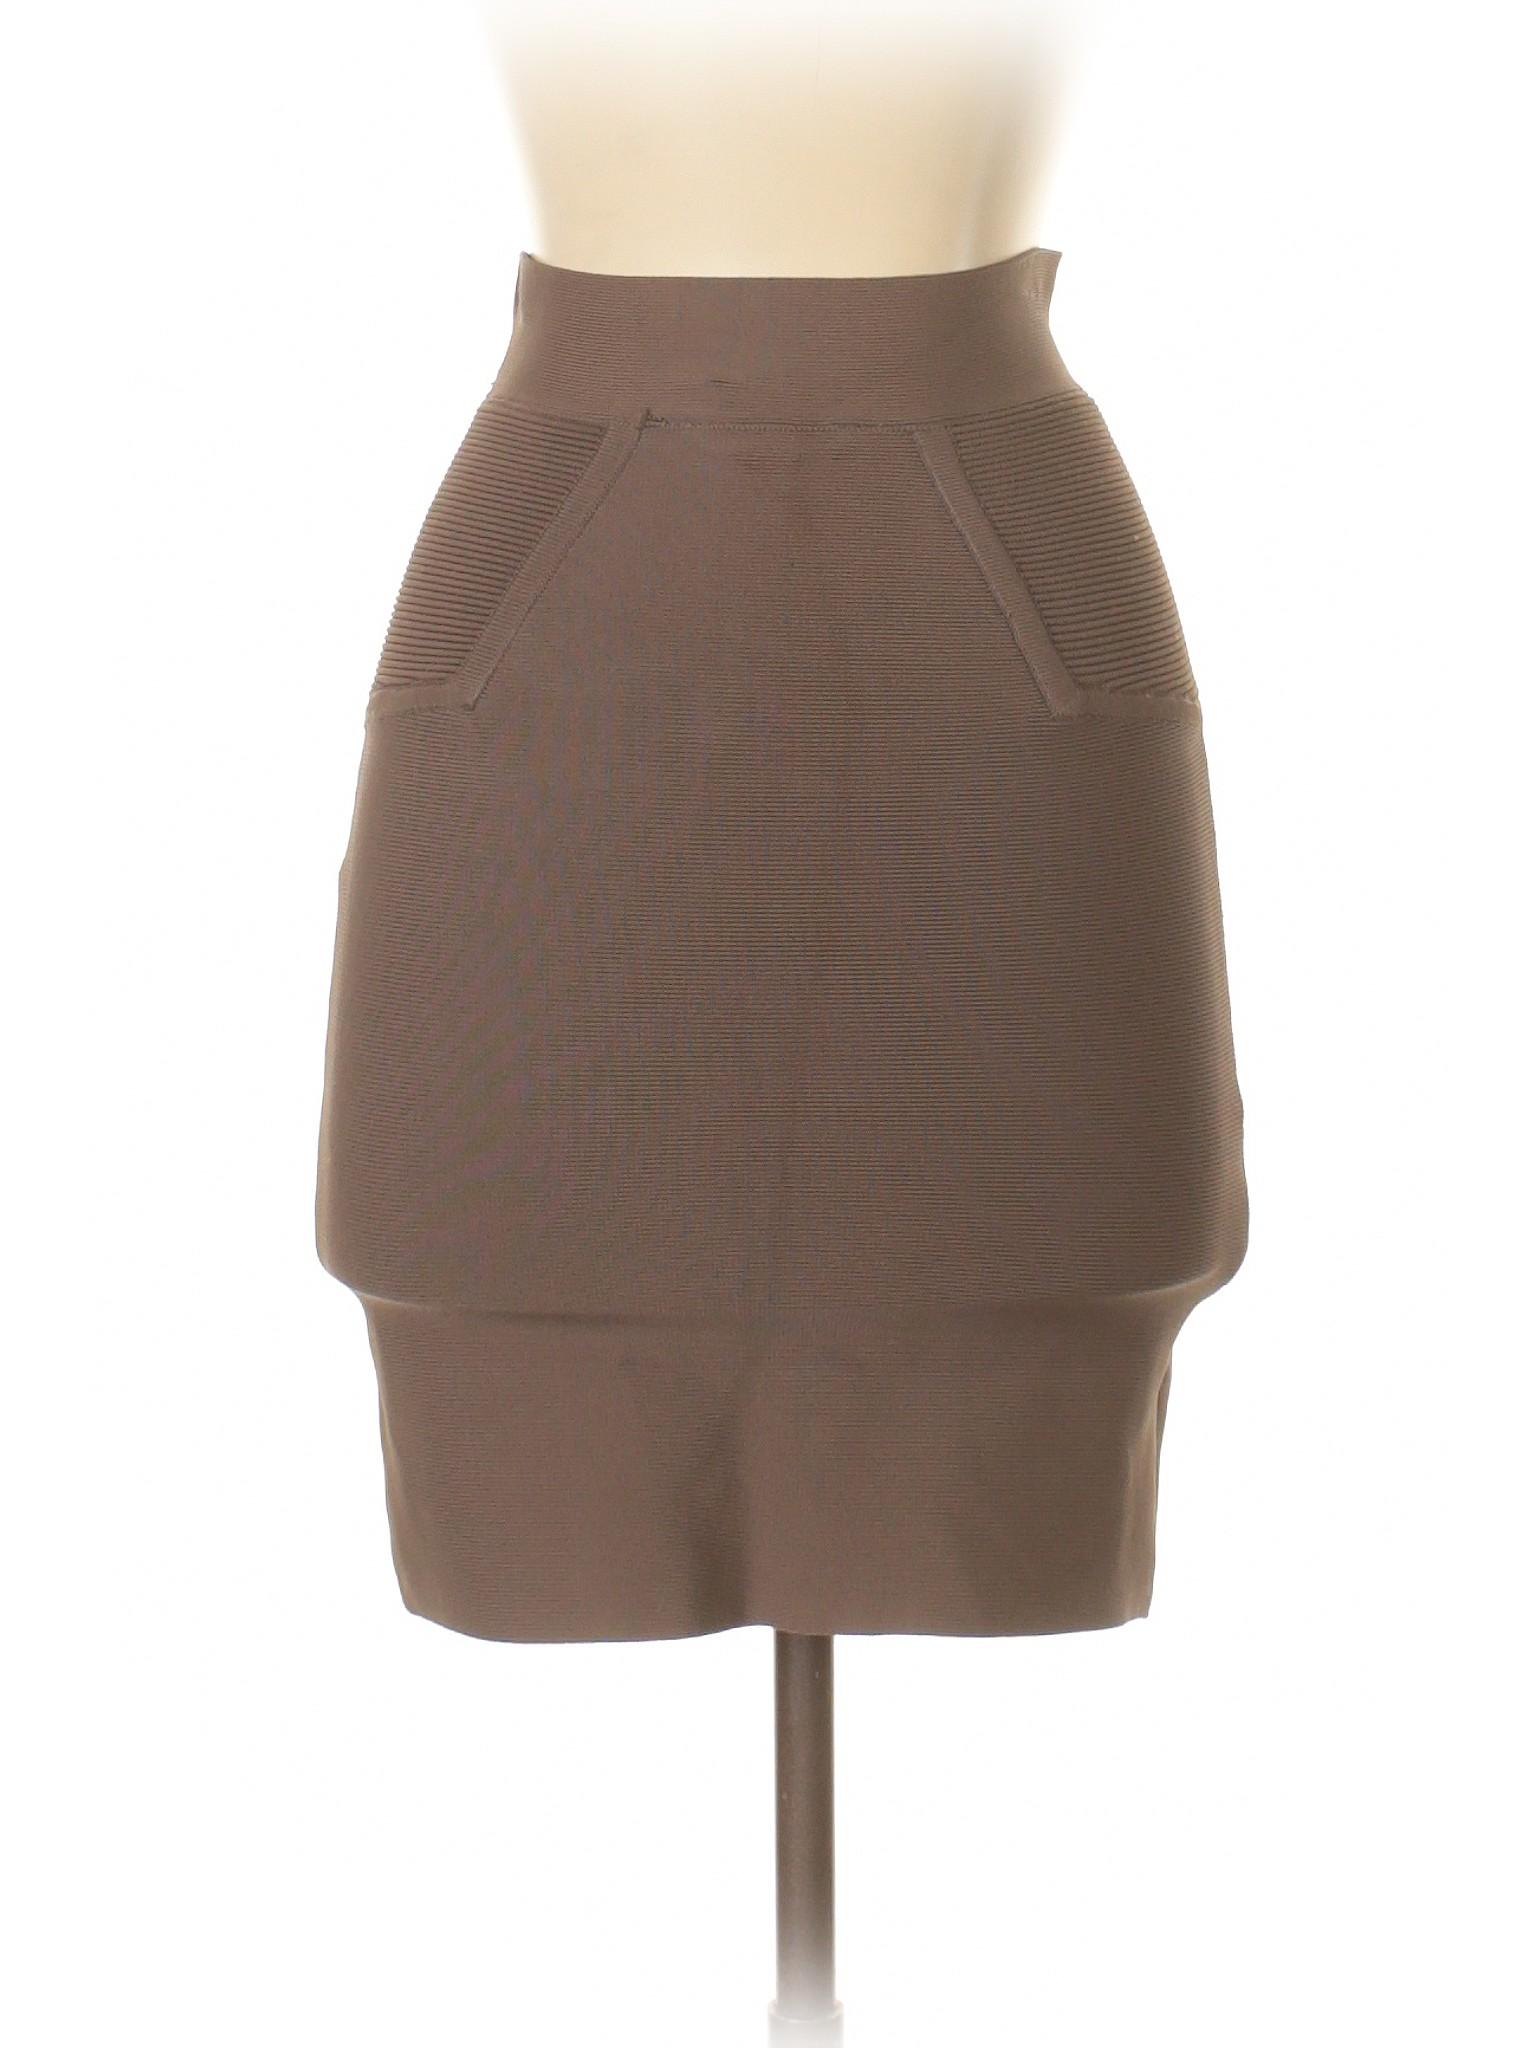 Bcbgmaxazria Leisure Skirt Boutique Skirt Casual Bcbgmaxazria Casual Boutique Leisure qEpdn8P